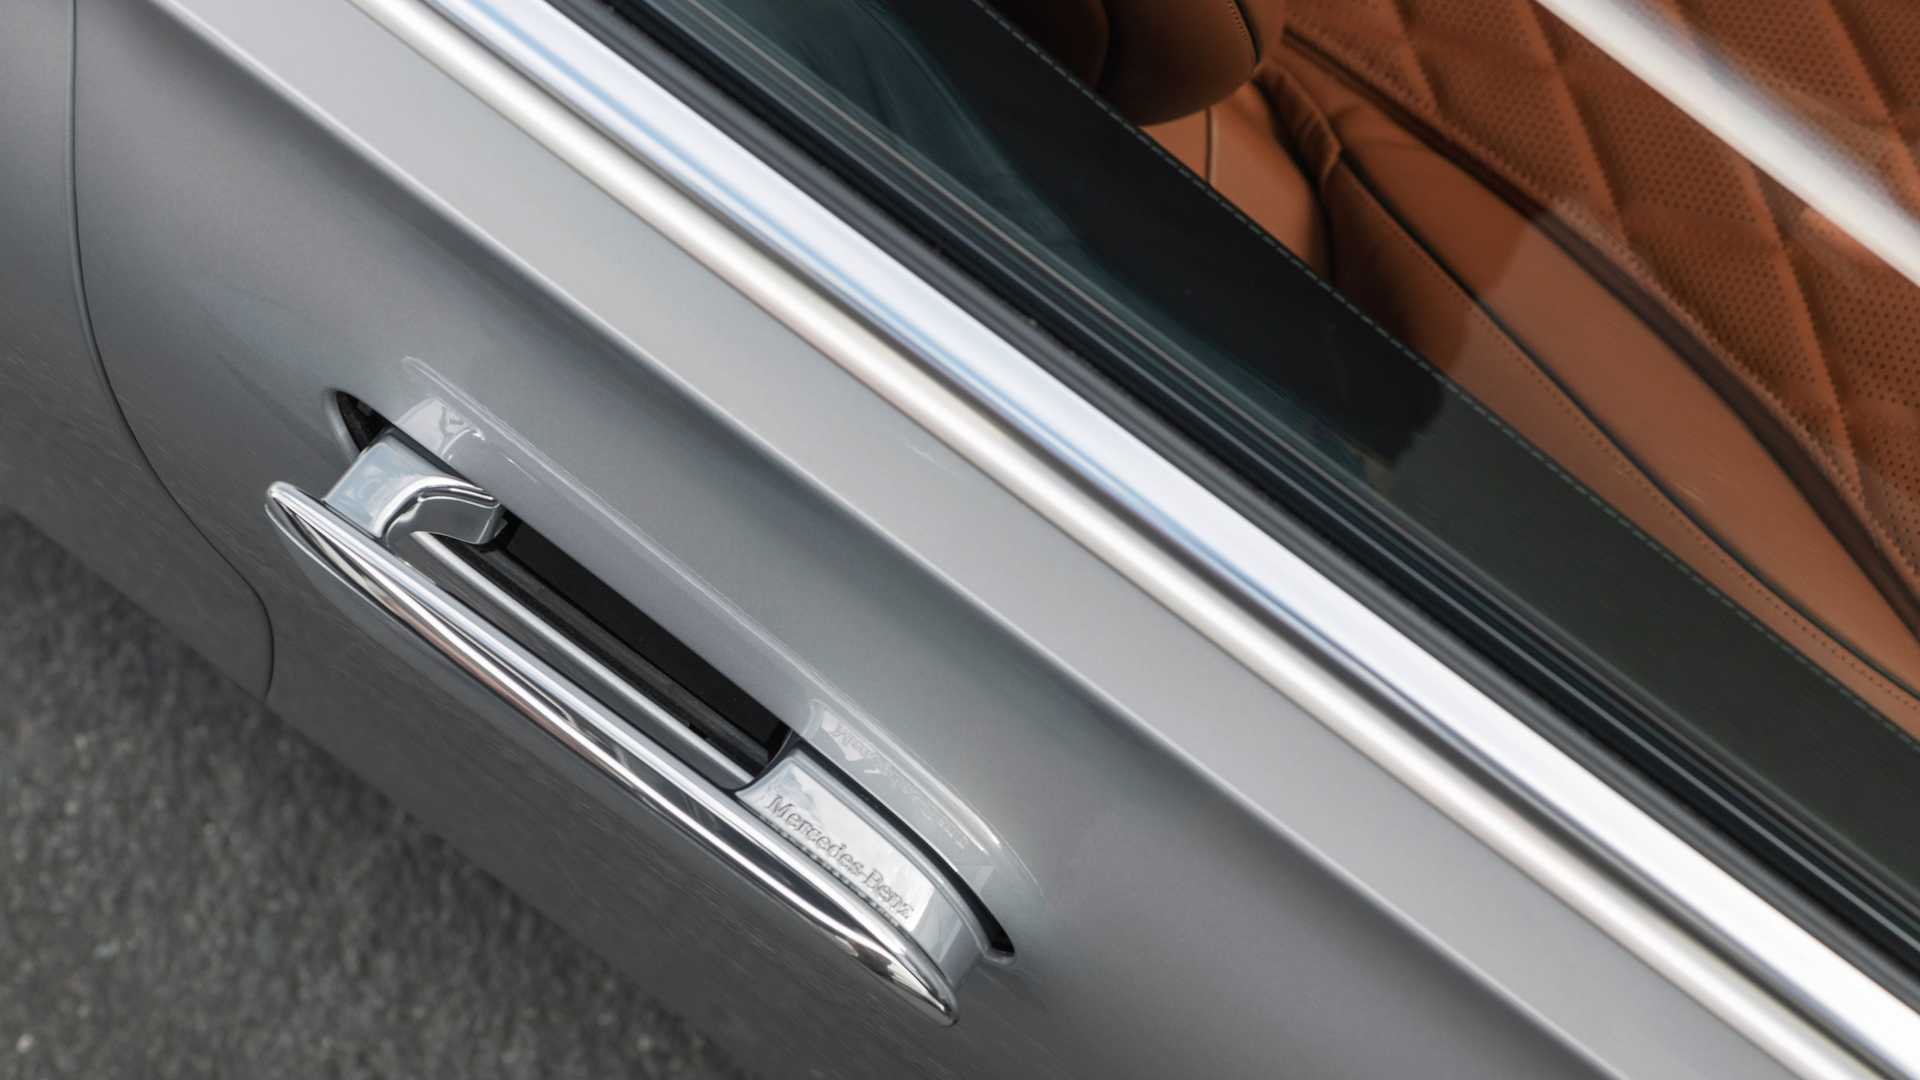 2021-mercedes-benz-s-class-exterior (4)